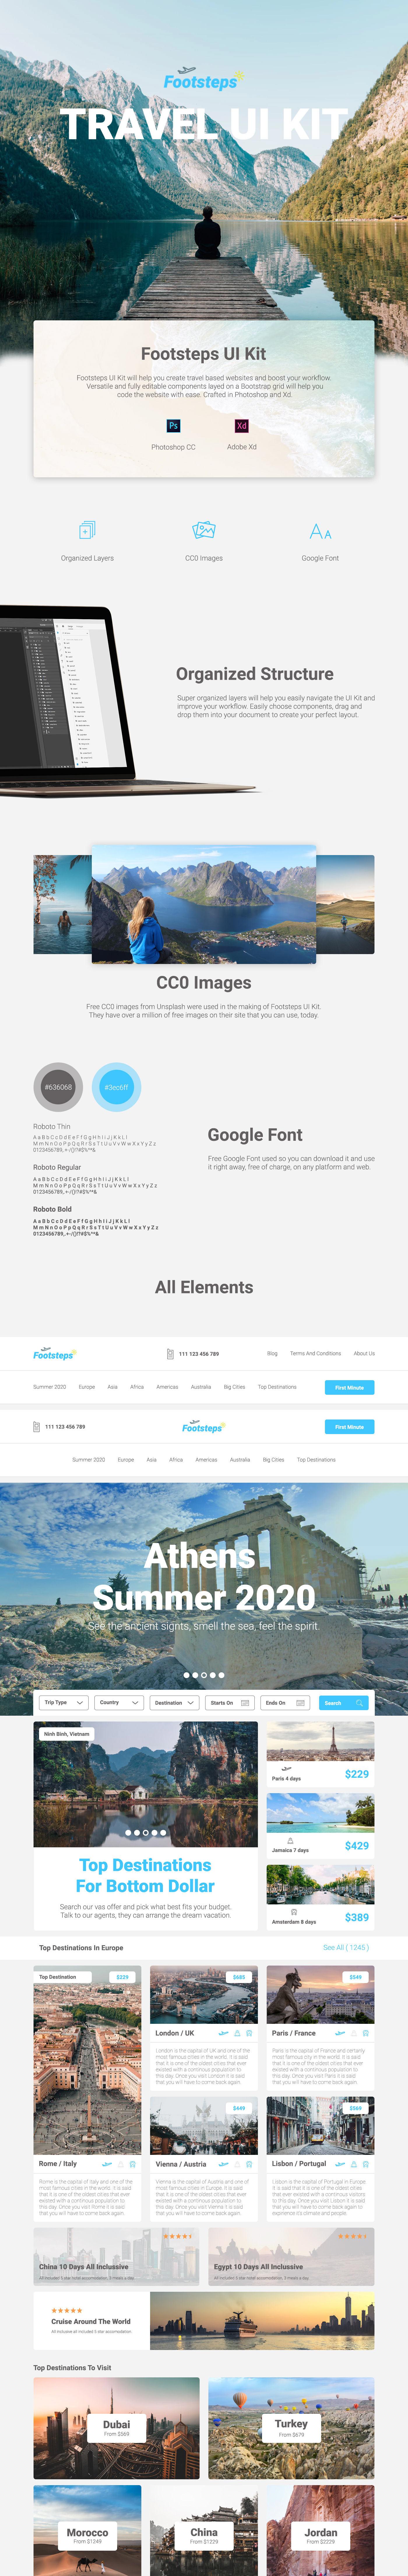 free freebie free ui kit ui kit Web Website Web UI Kit photoshop Made With AdobeXD Web Design